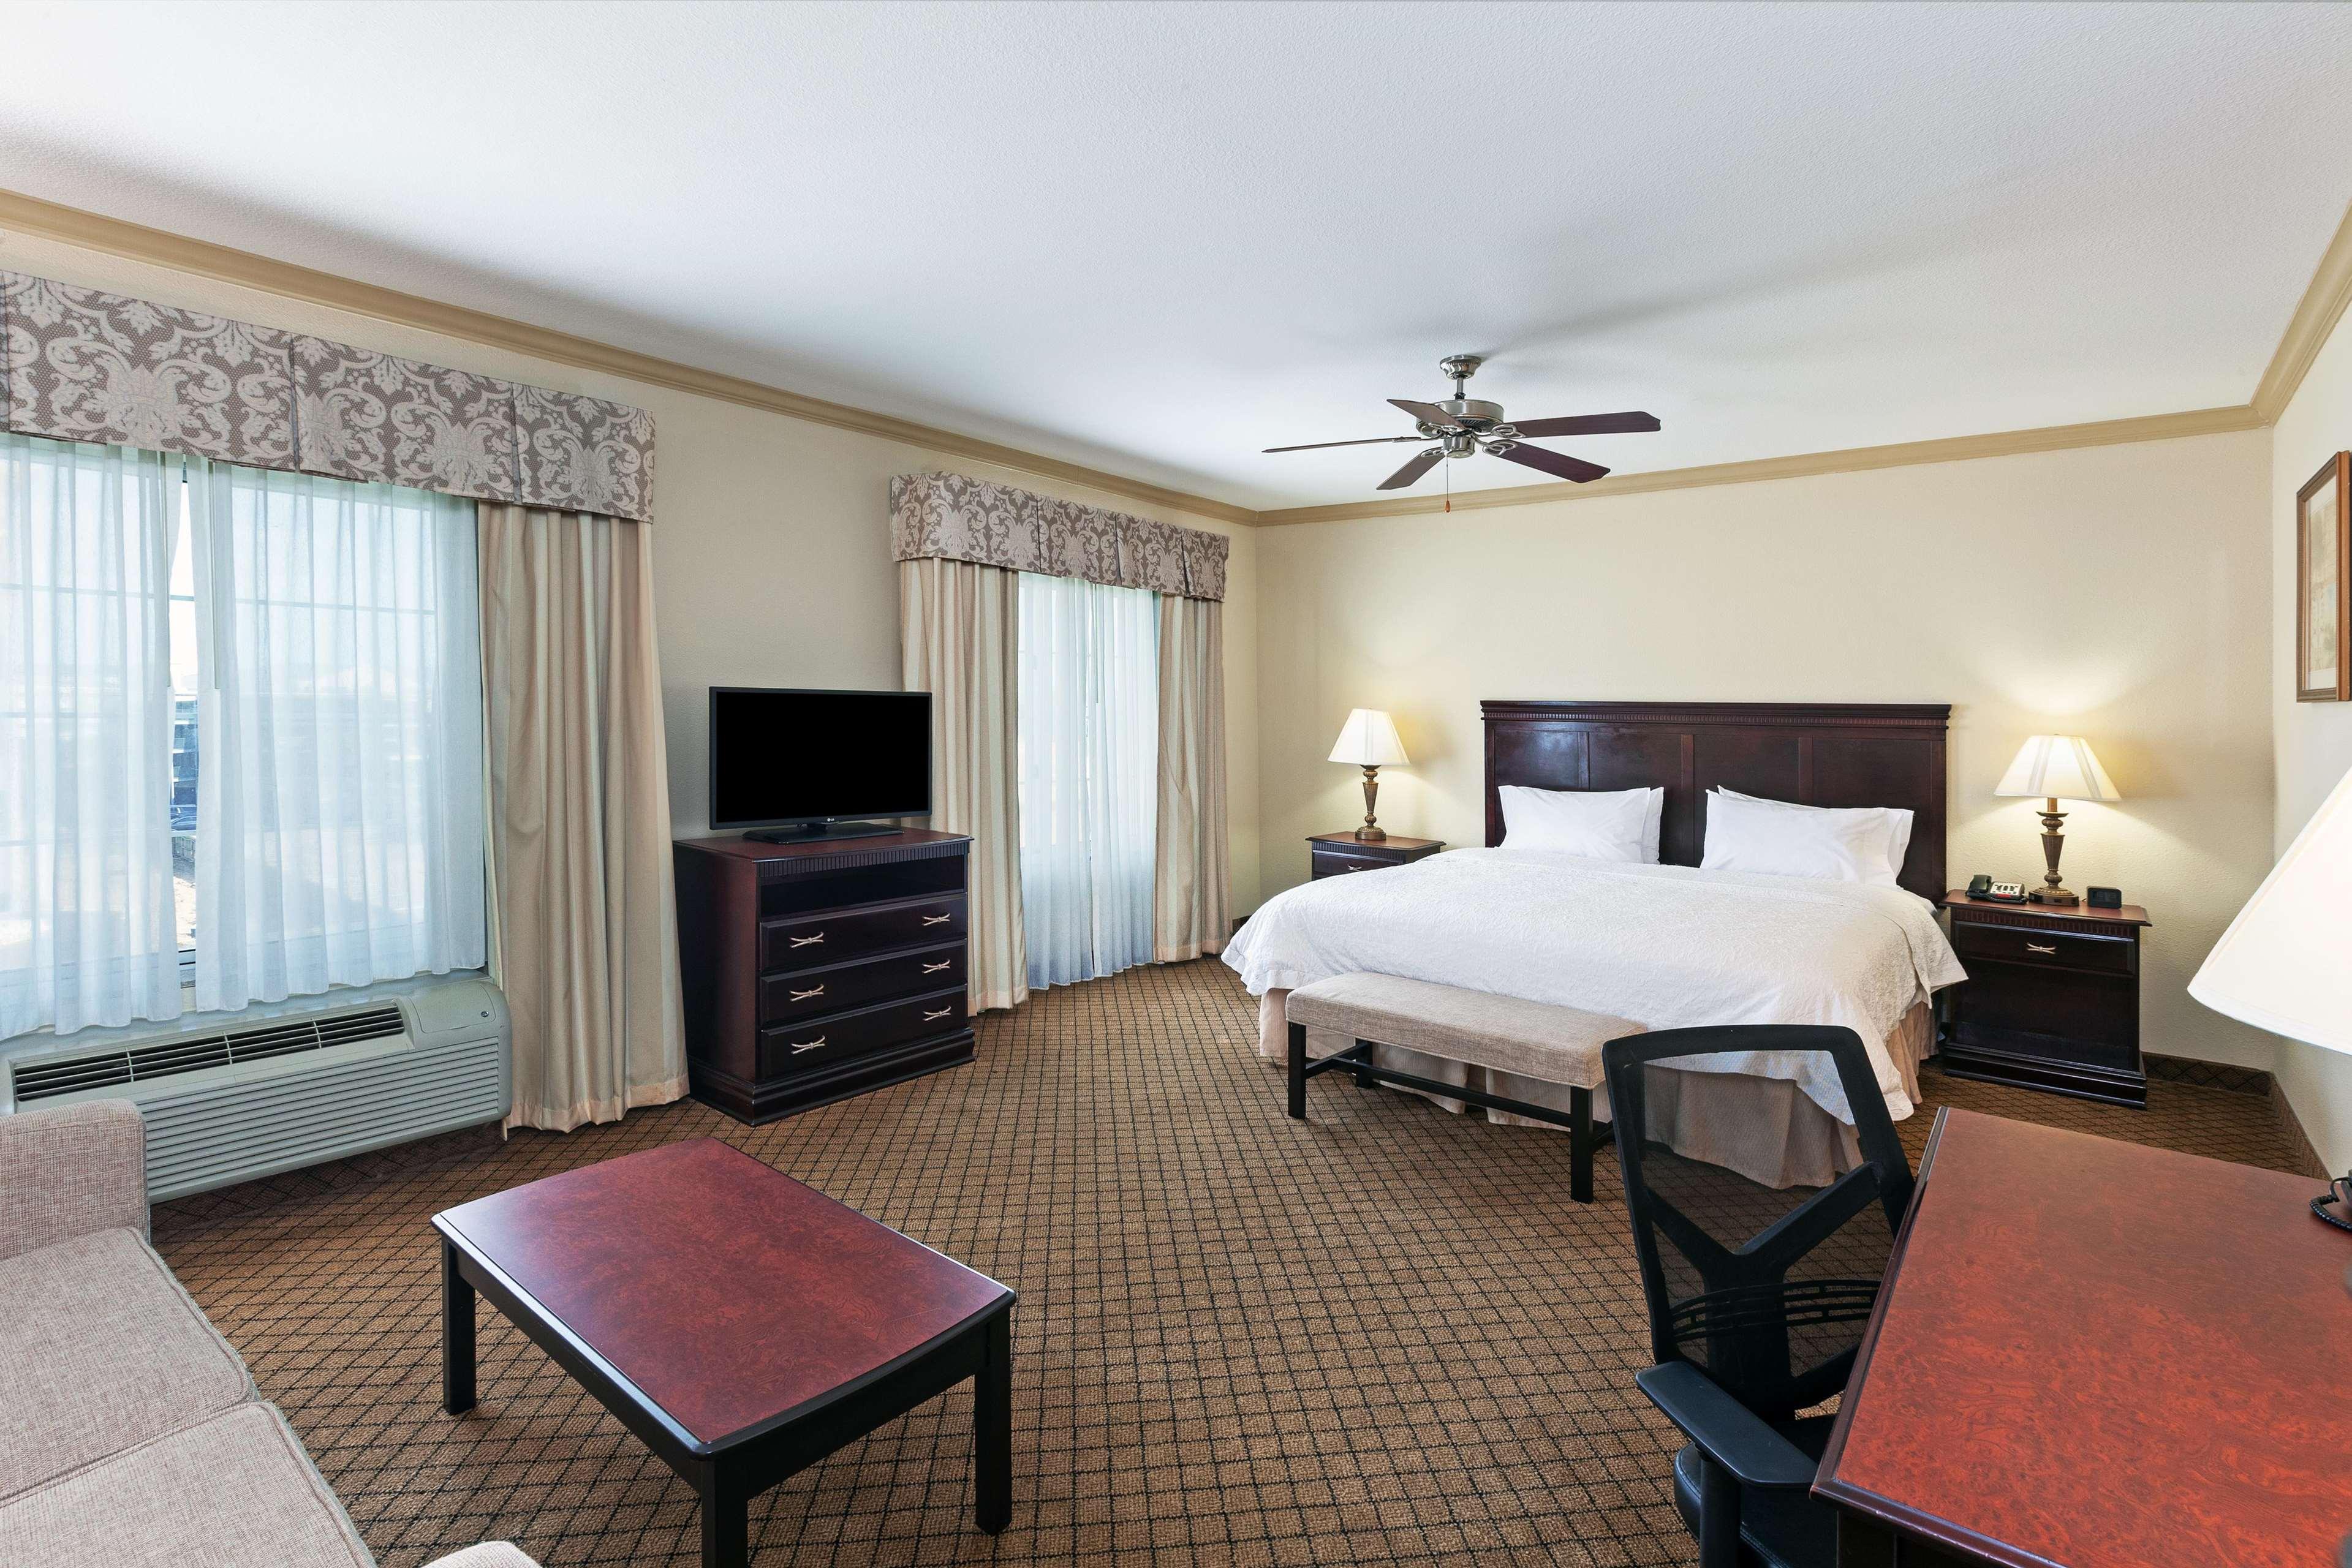 Hampton Inn & Suites Galveston image 20